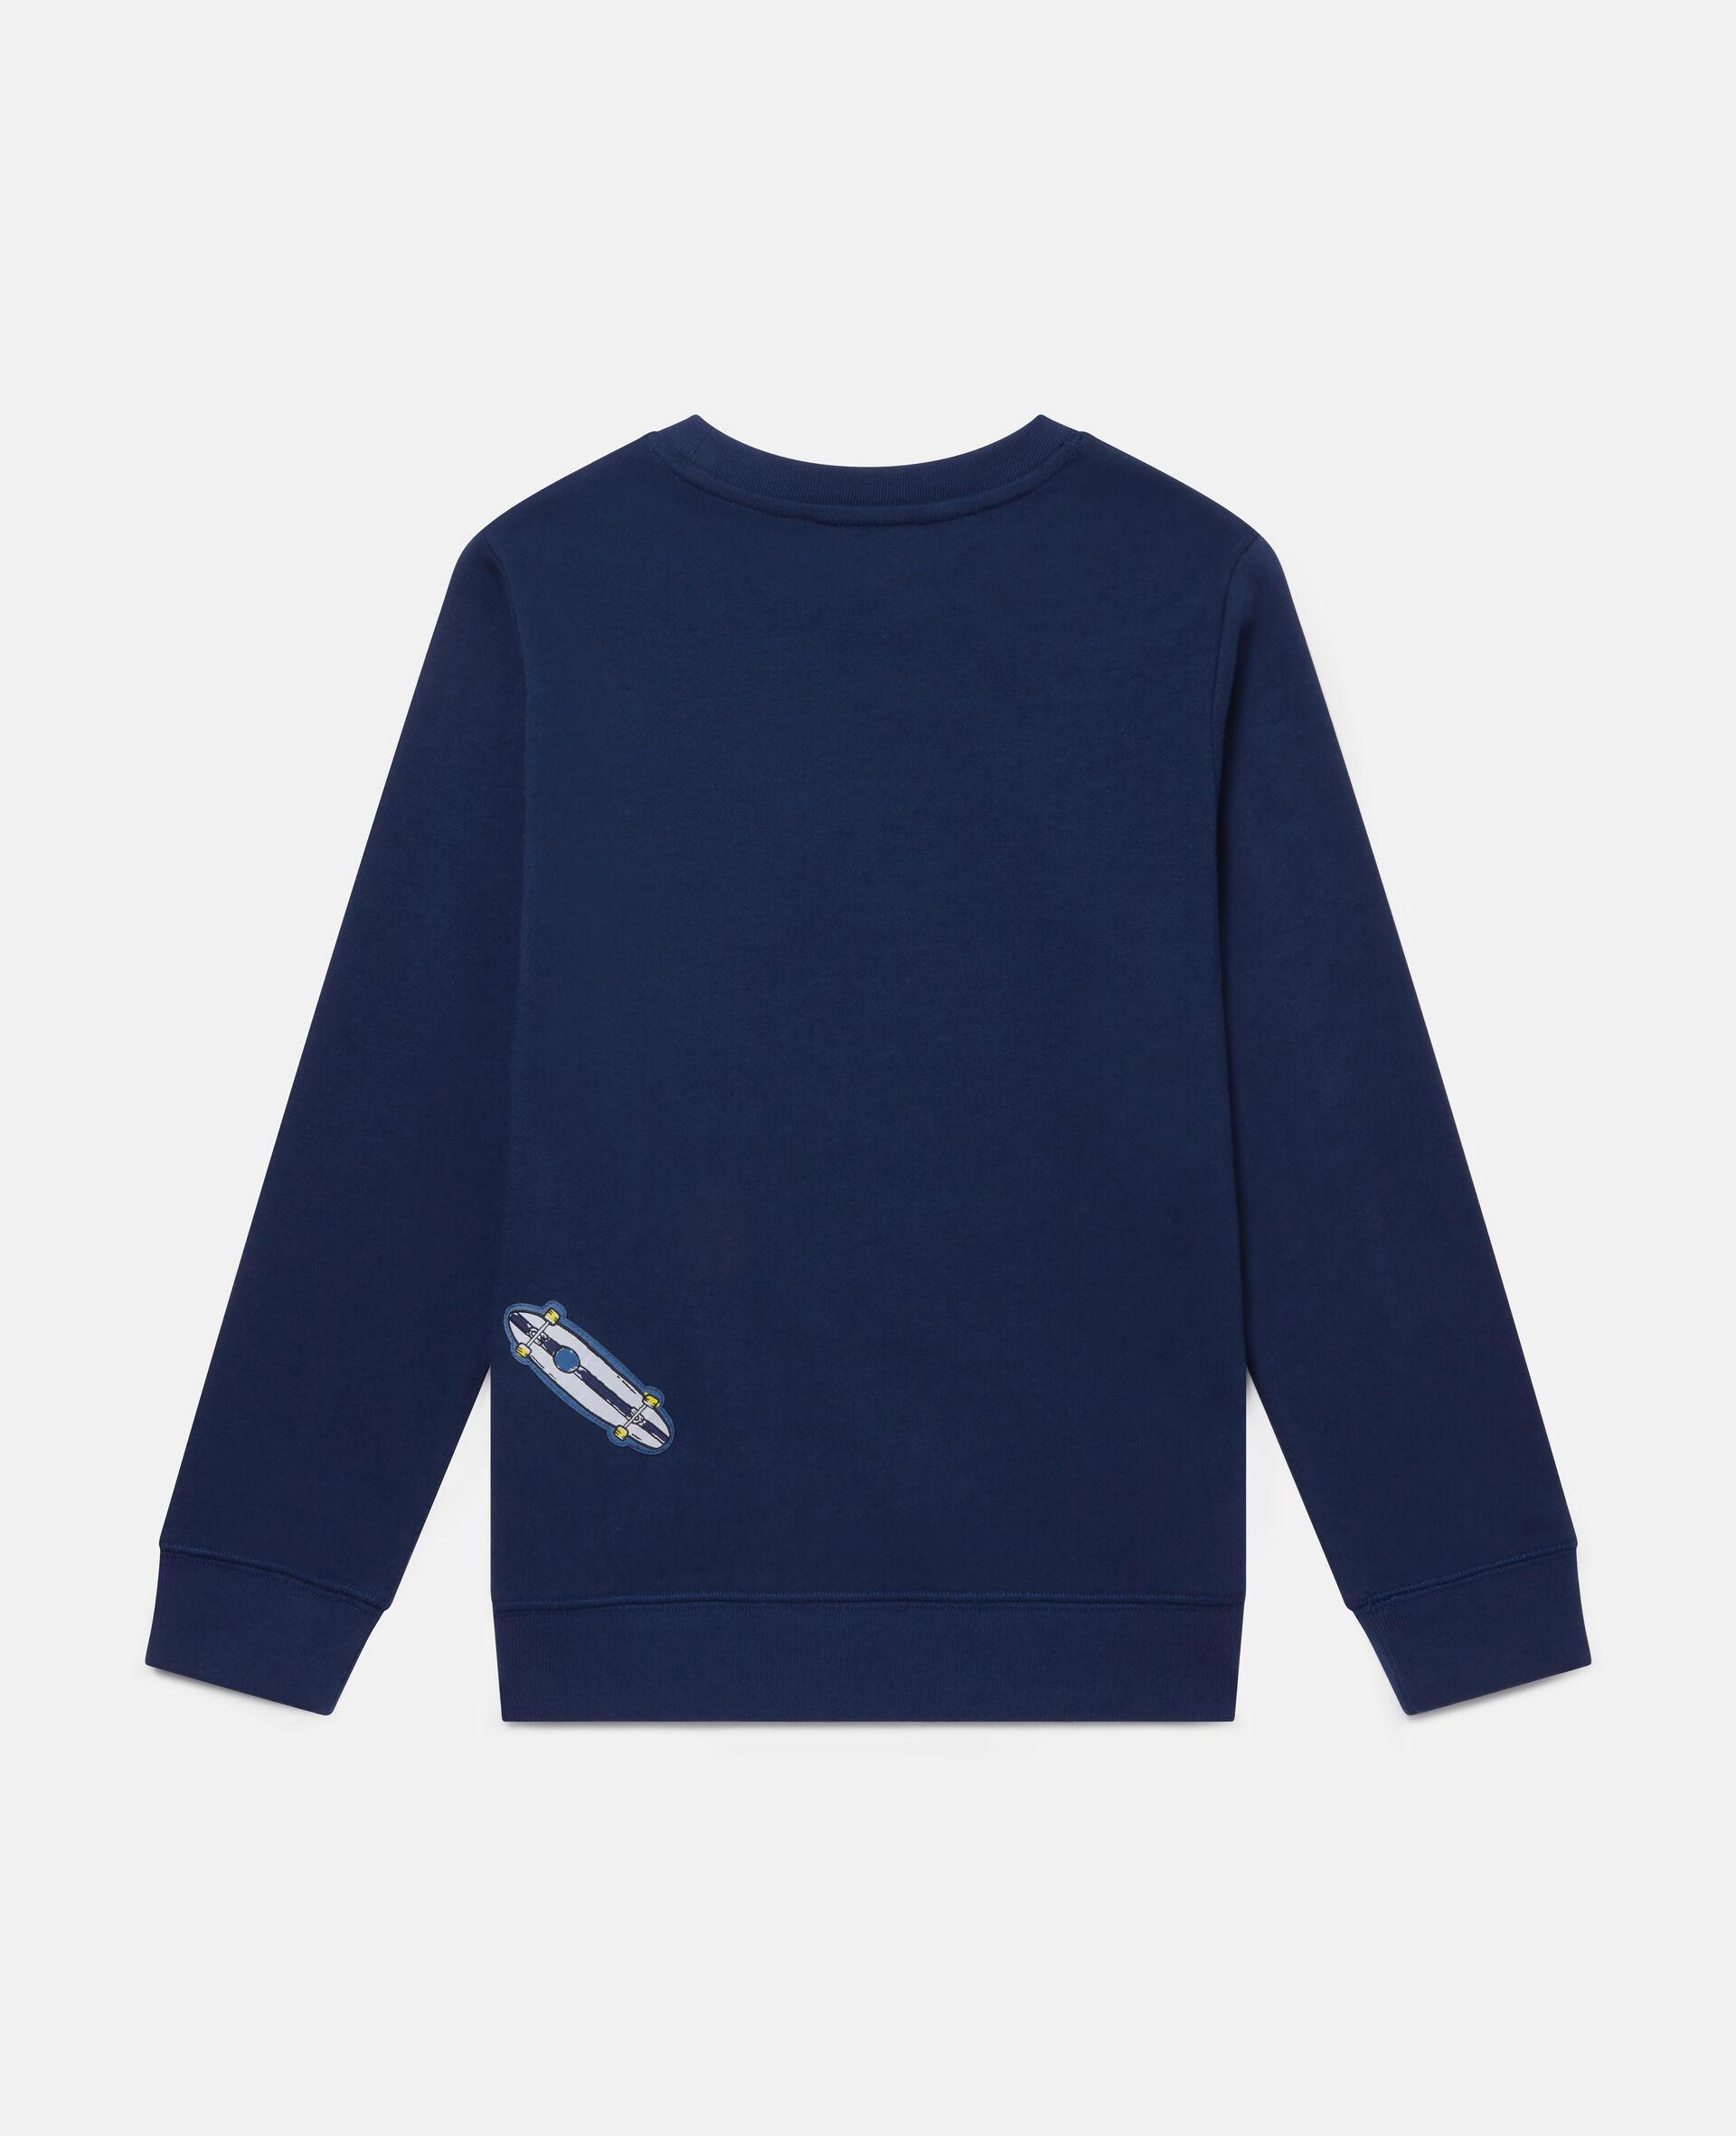 Pizza Badges Fleece Sweatshirt-Blue-large image number 3